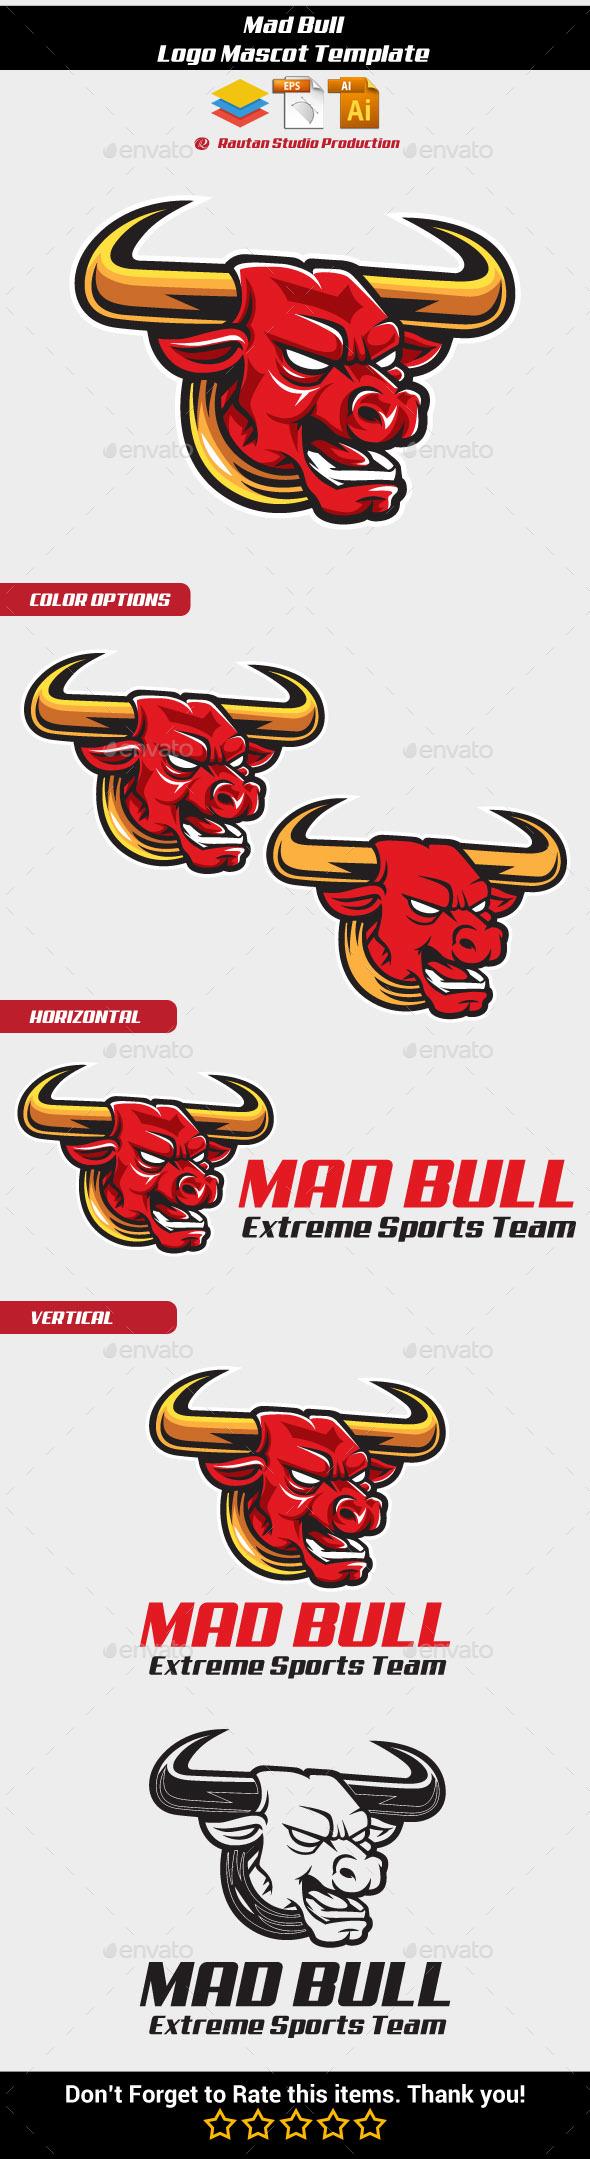 Mad Bull Logo Mascot